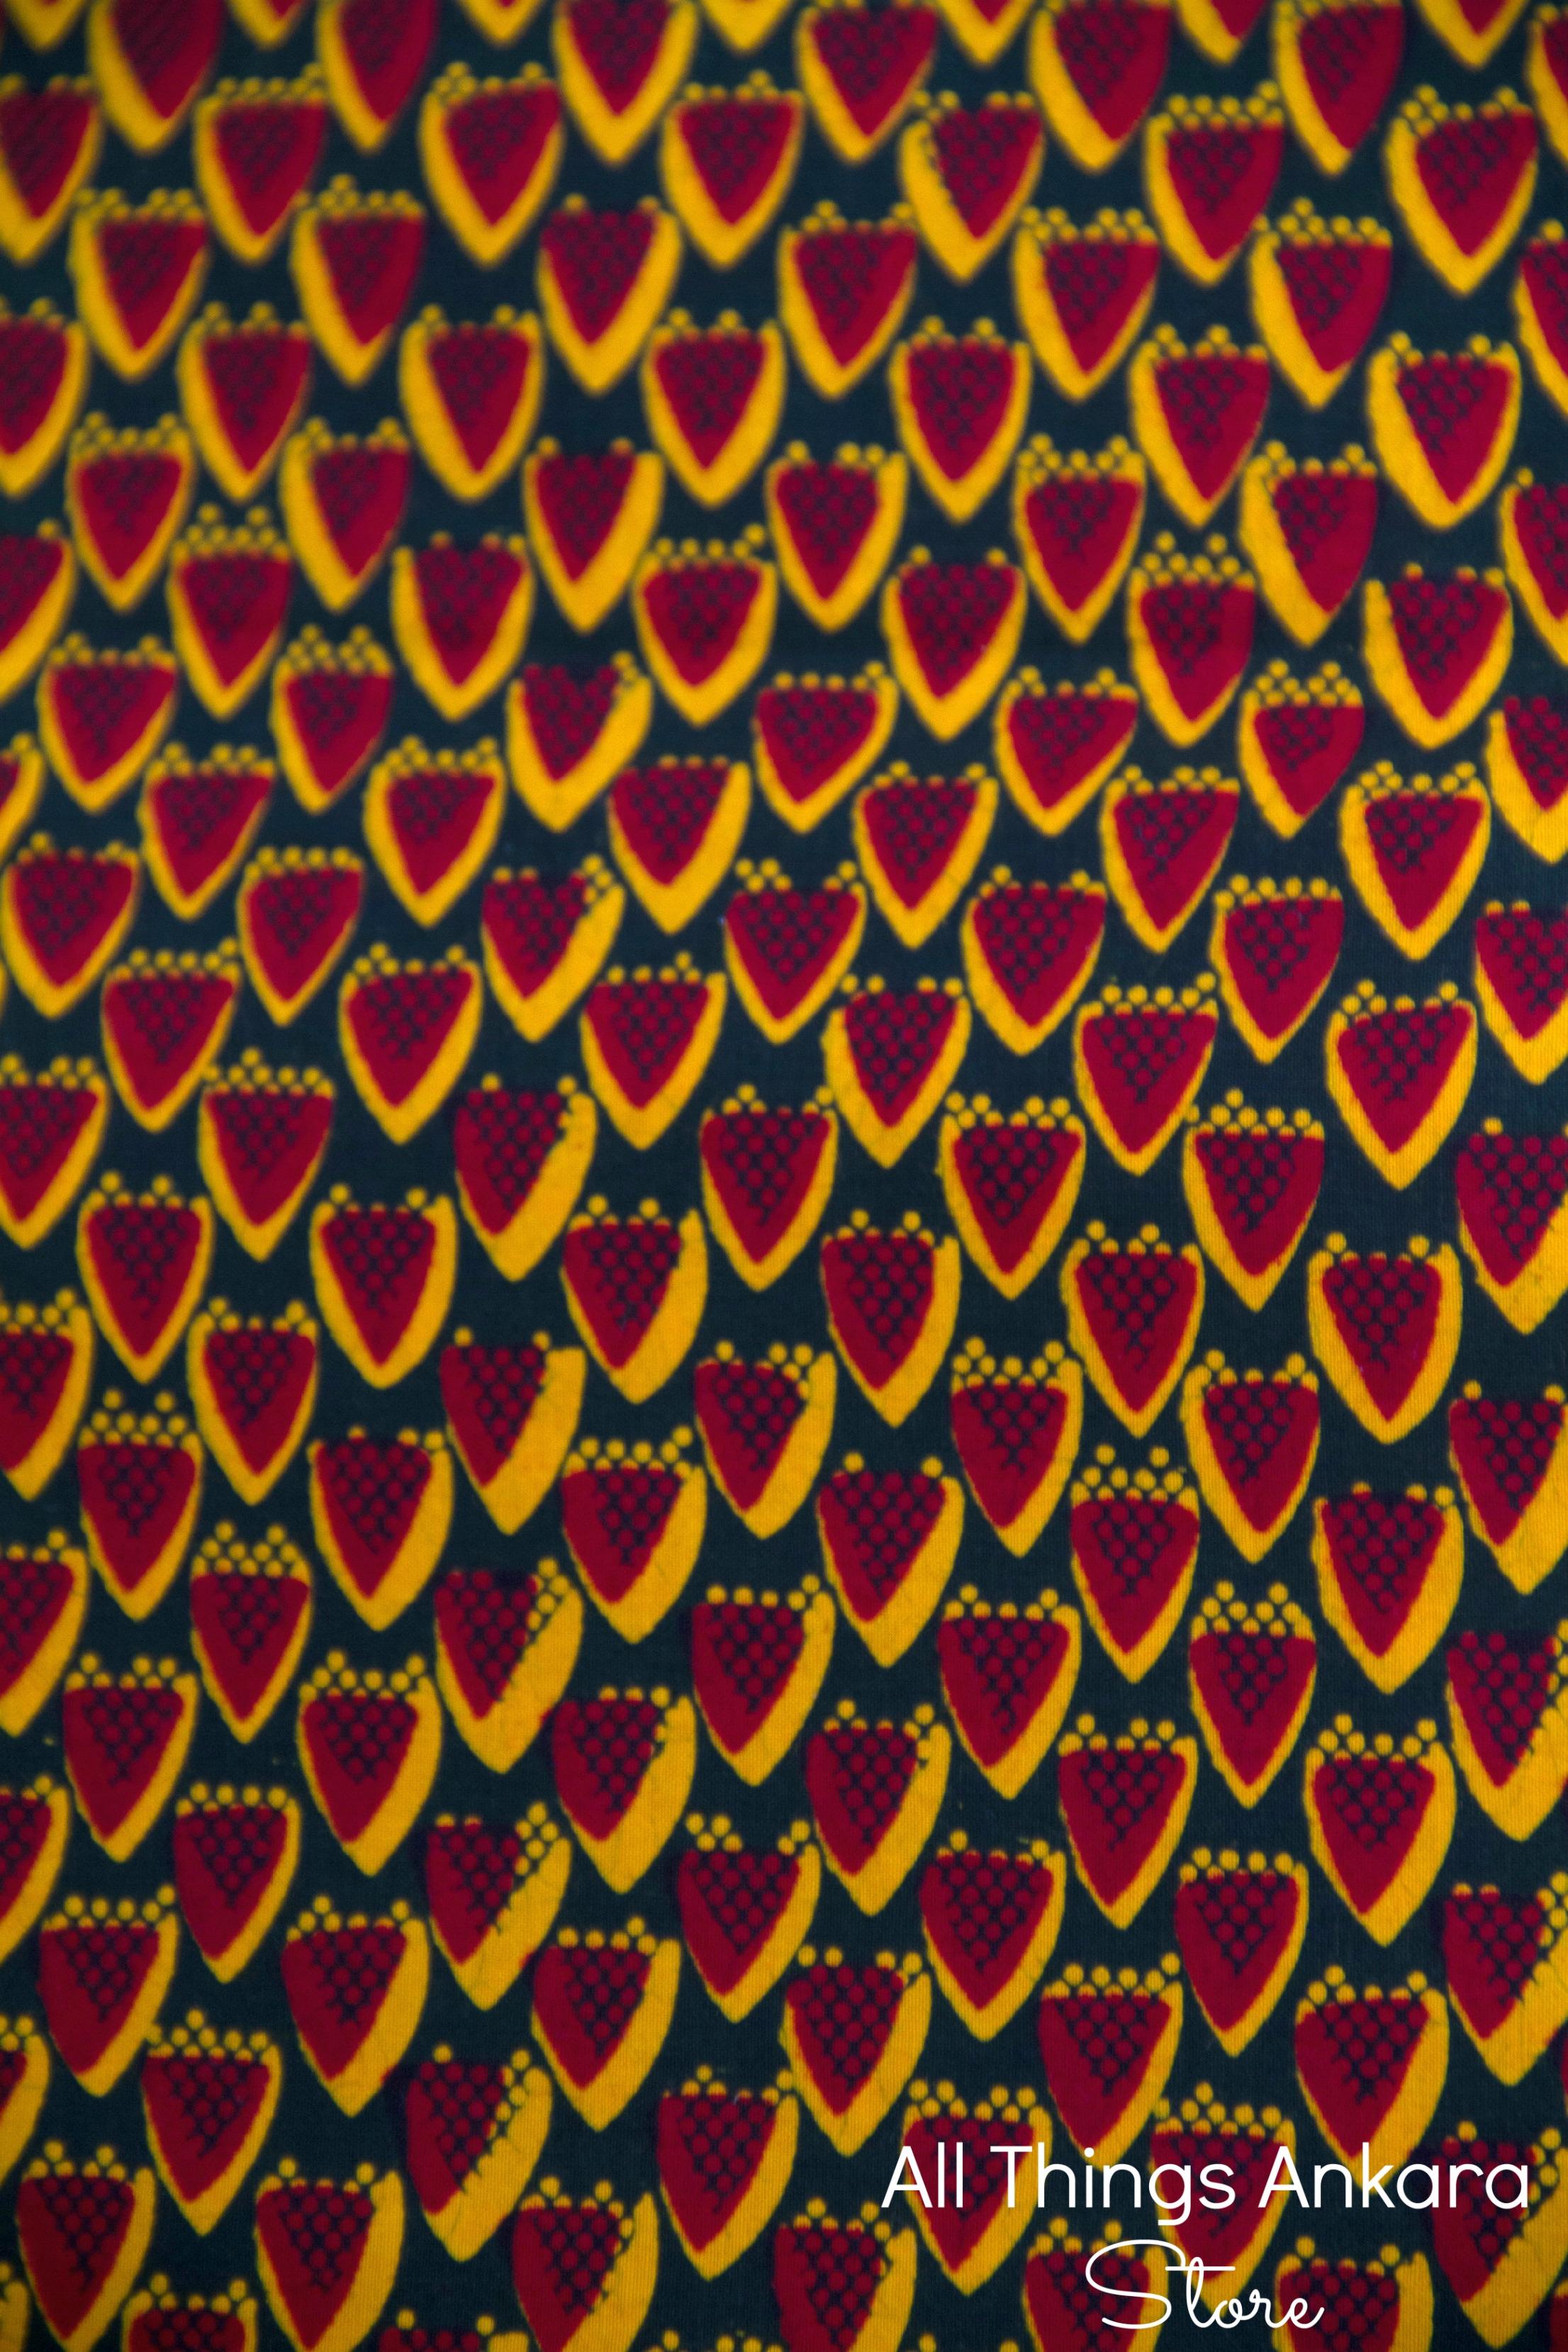 red-yellow-black-wedge-half-wax-prints